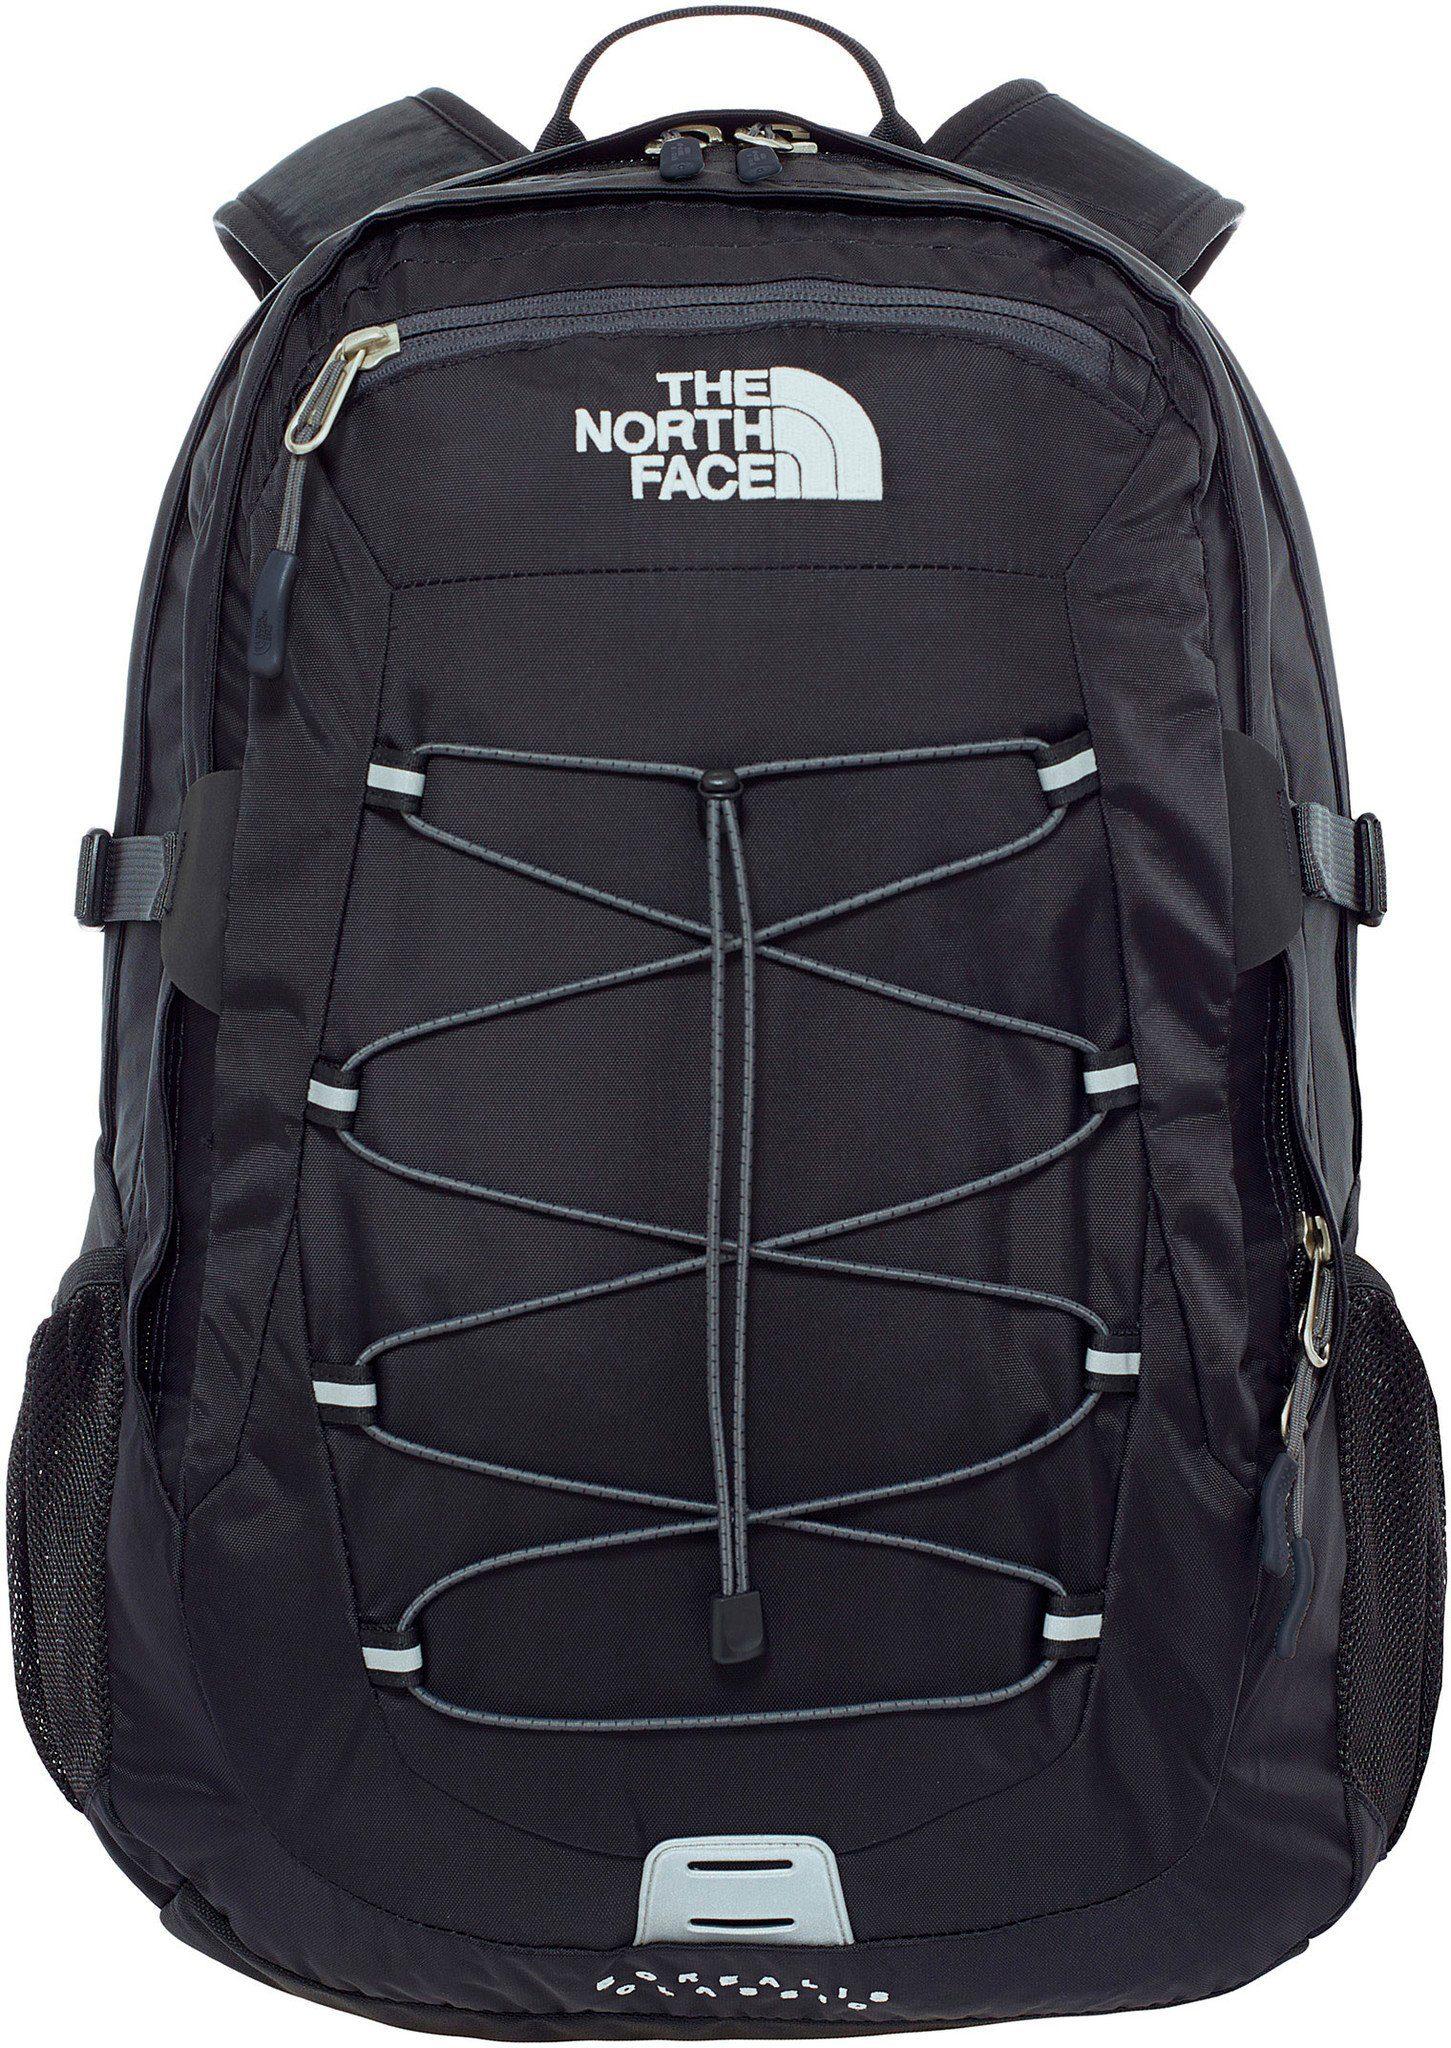 The North Face Sport- und Freizeittasche »Borealis Classic Backpack 29 L«